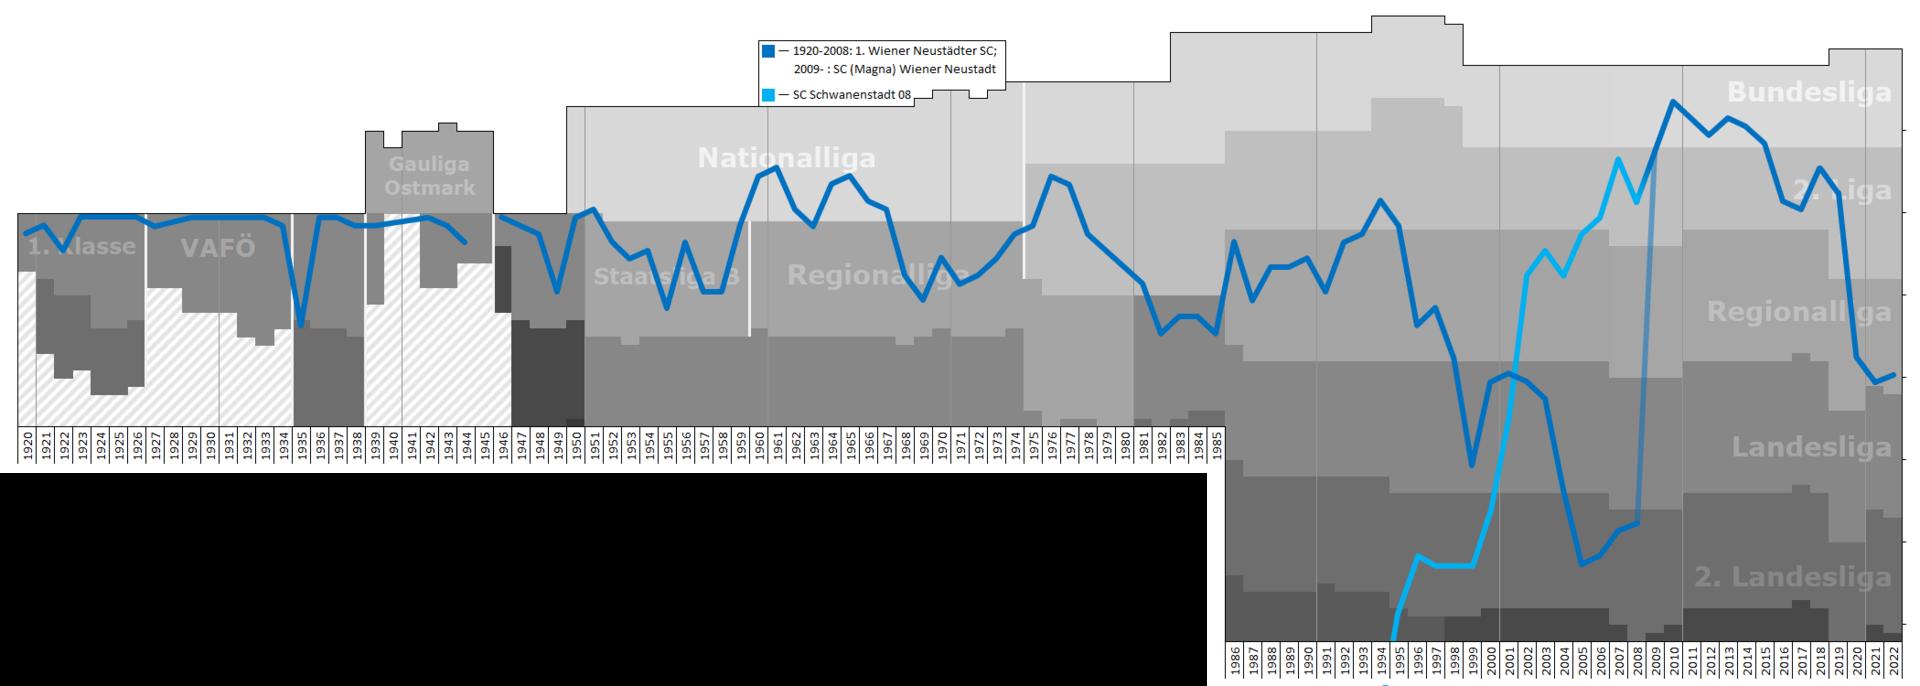 1920px-Wiener_neustadt_Performance_Graph